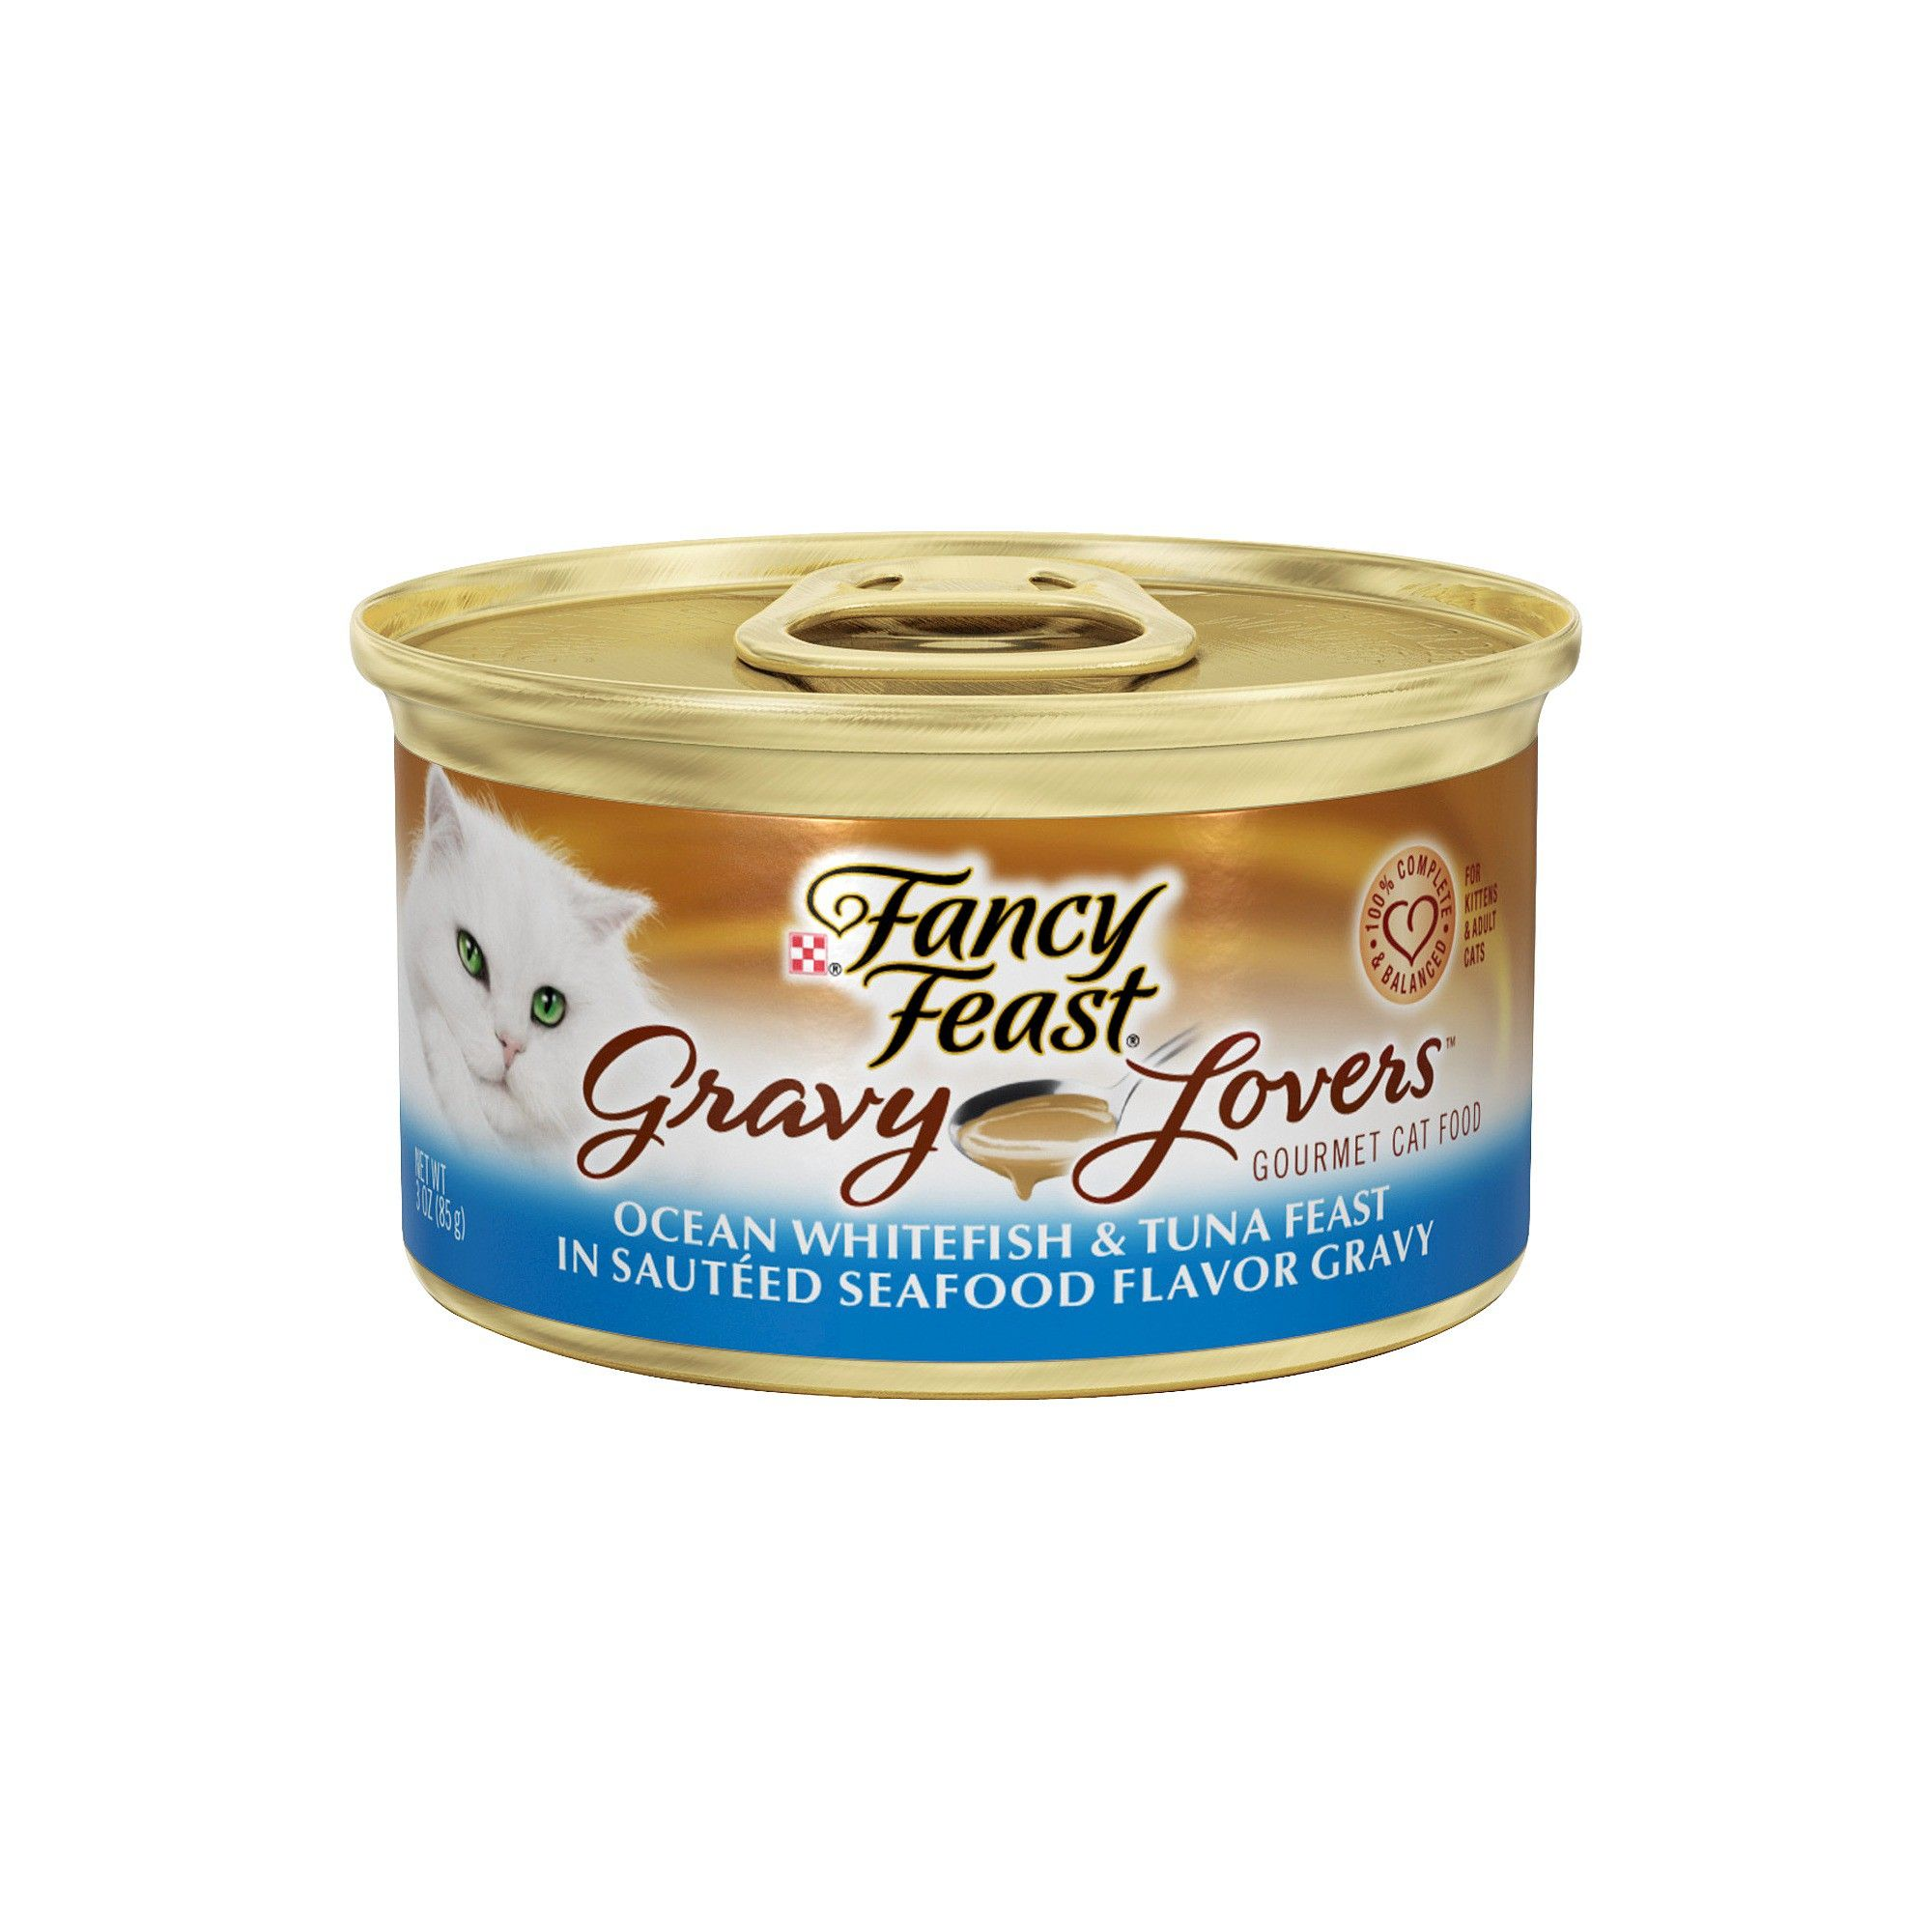 Purina Fancy Feast Gravy Lovers Ocean Whitefish & Tuna